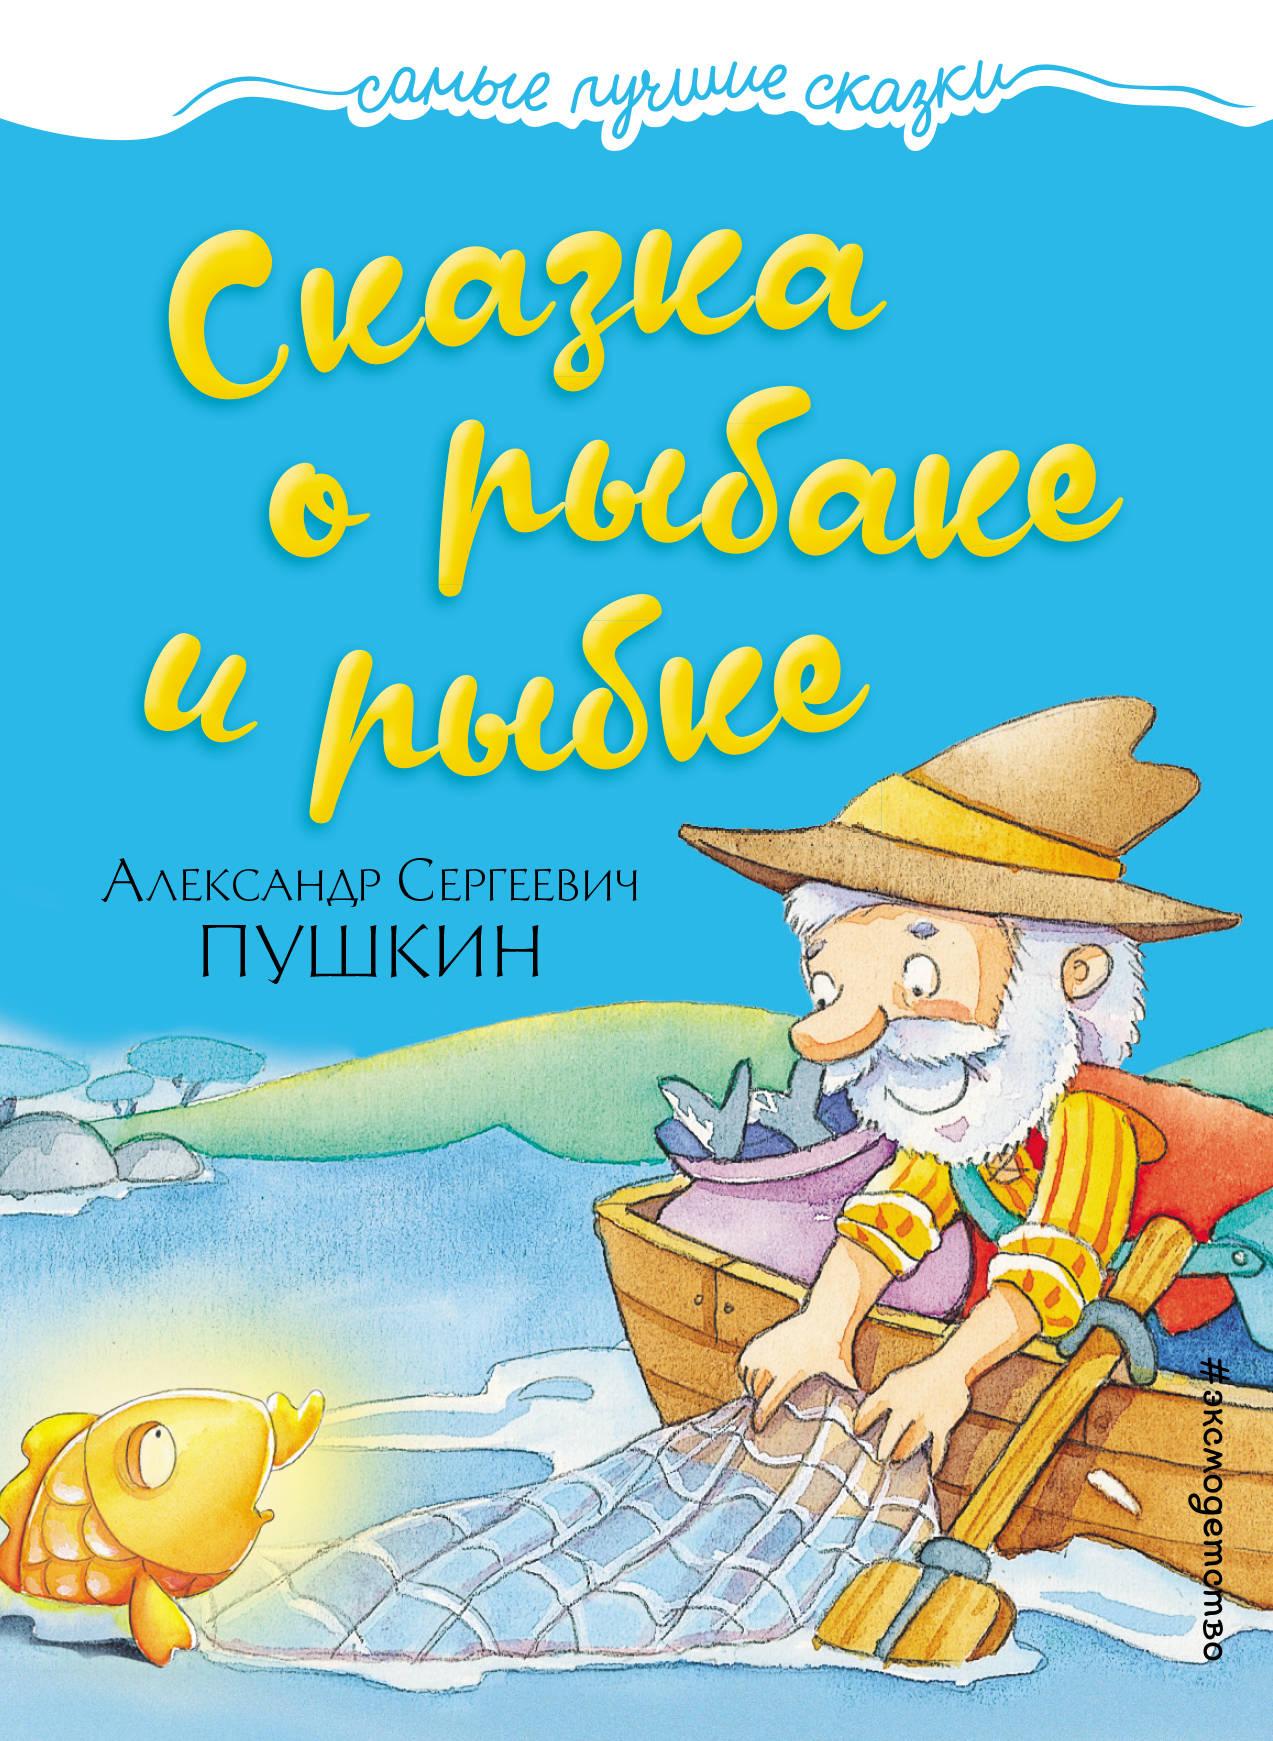 Пушкин Александр Сергеевич Сказка о рыбаке и рыбке